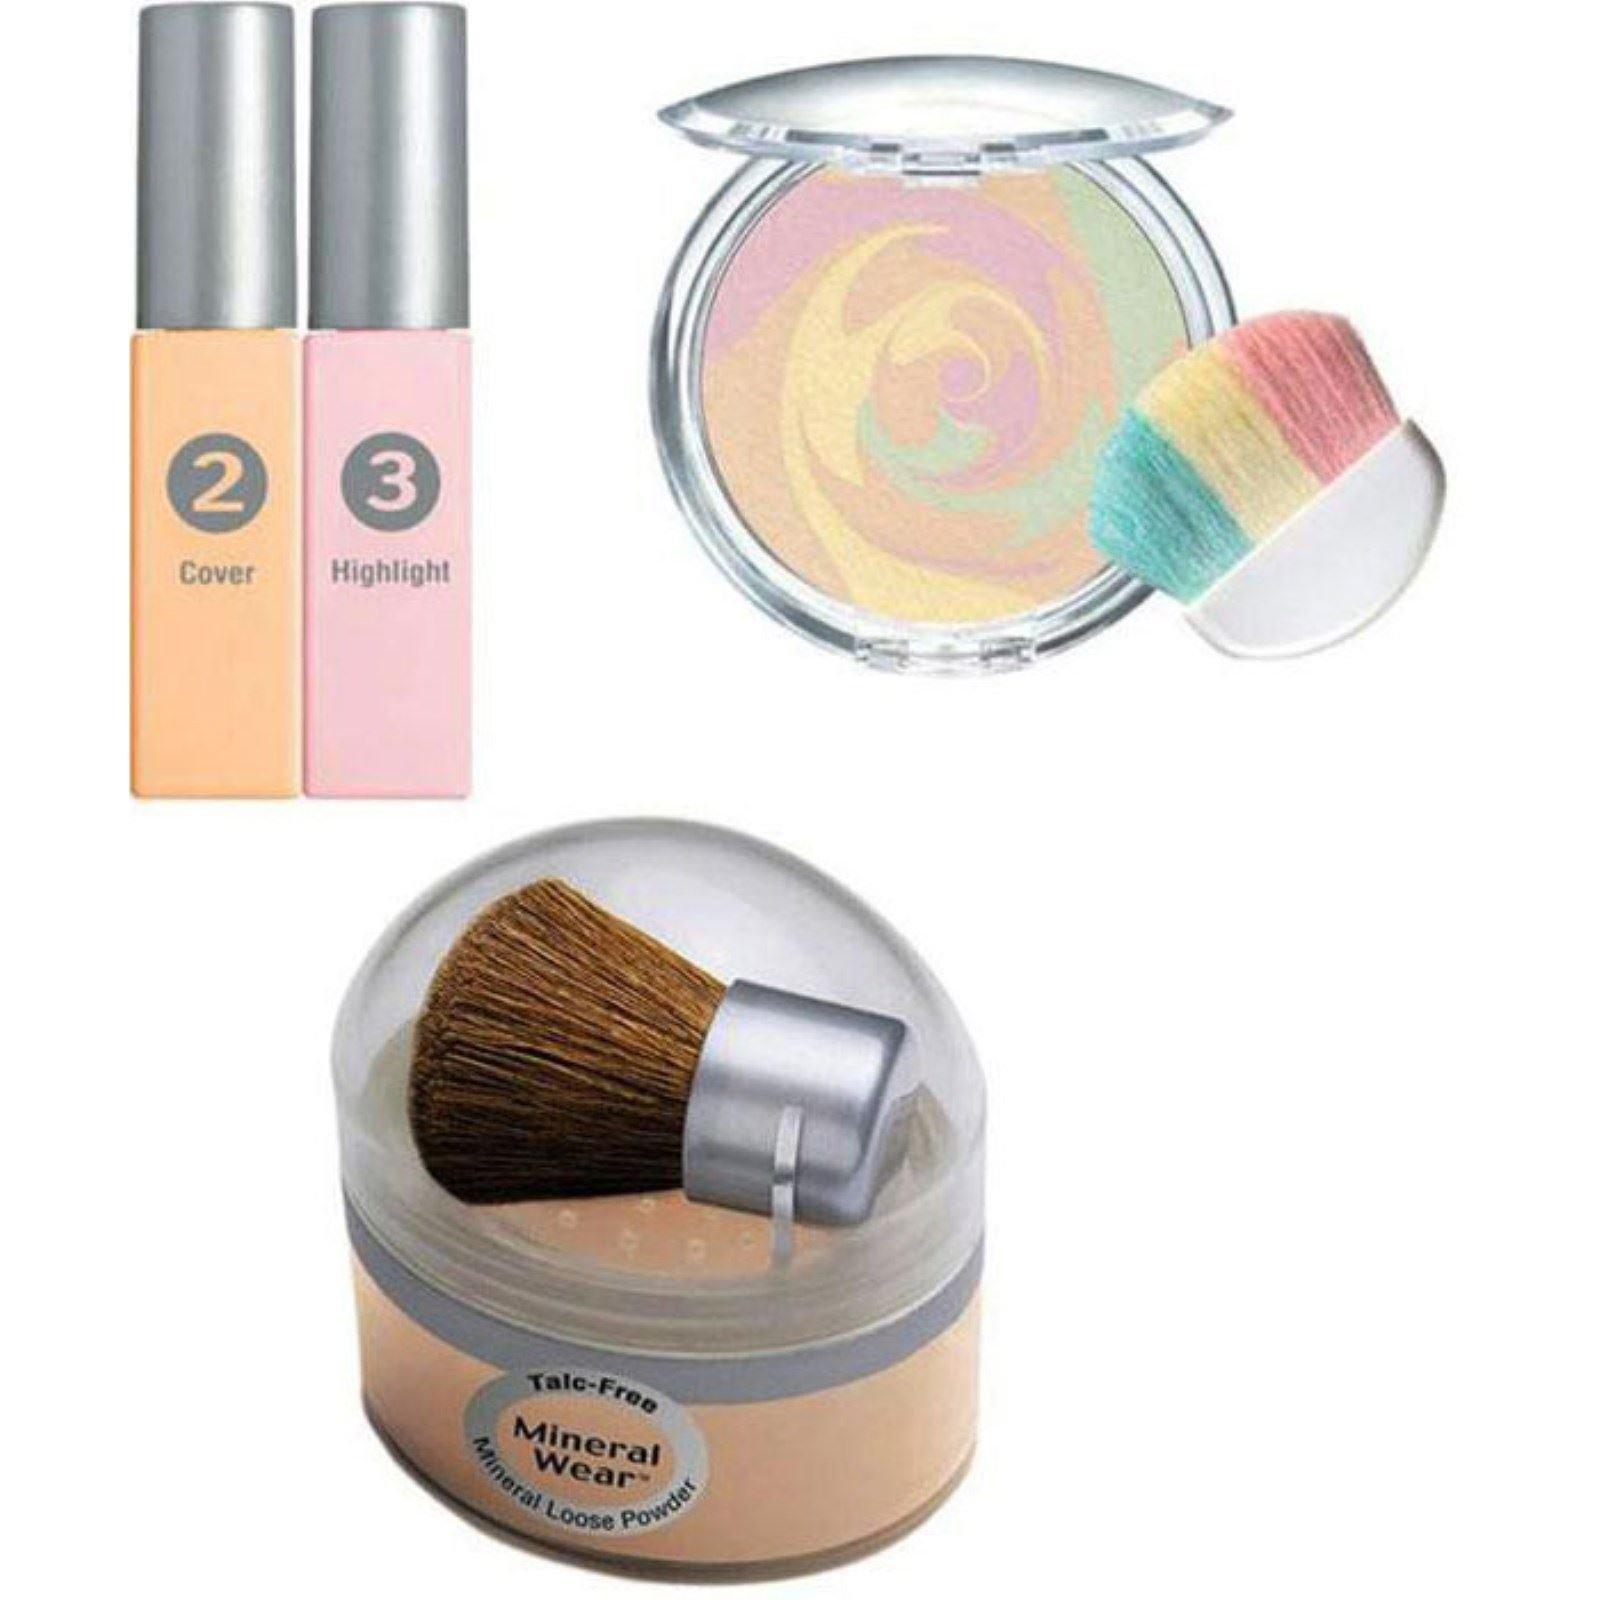 Physicians Formula Mineral Wear Makeup Kit, Medium, Loose Powder, Bronzer, Blush